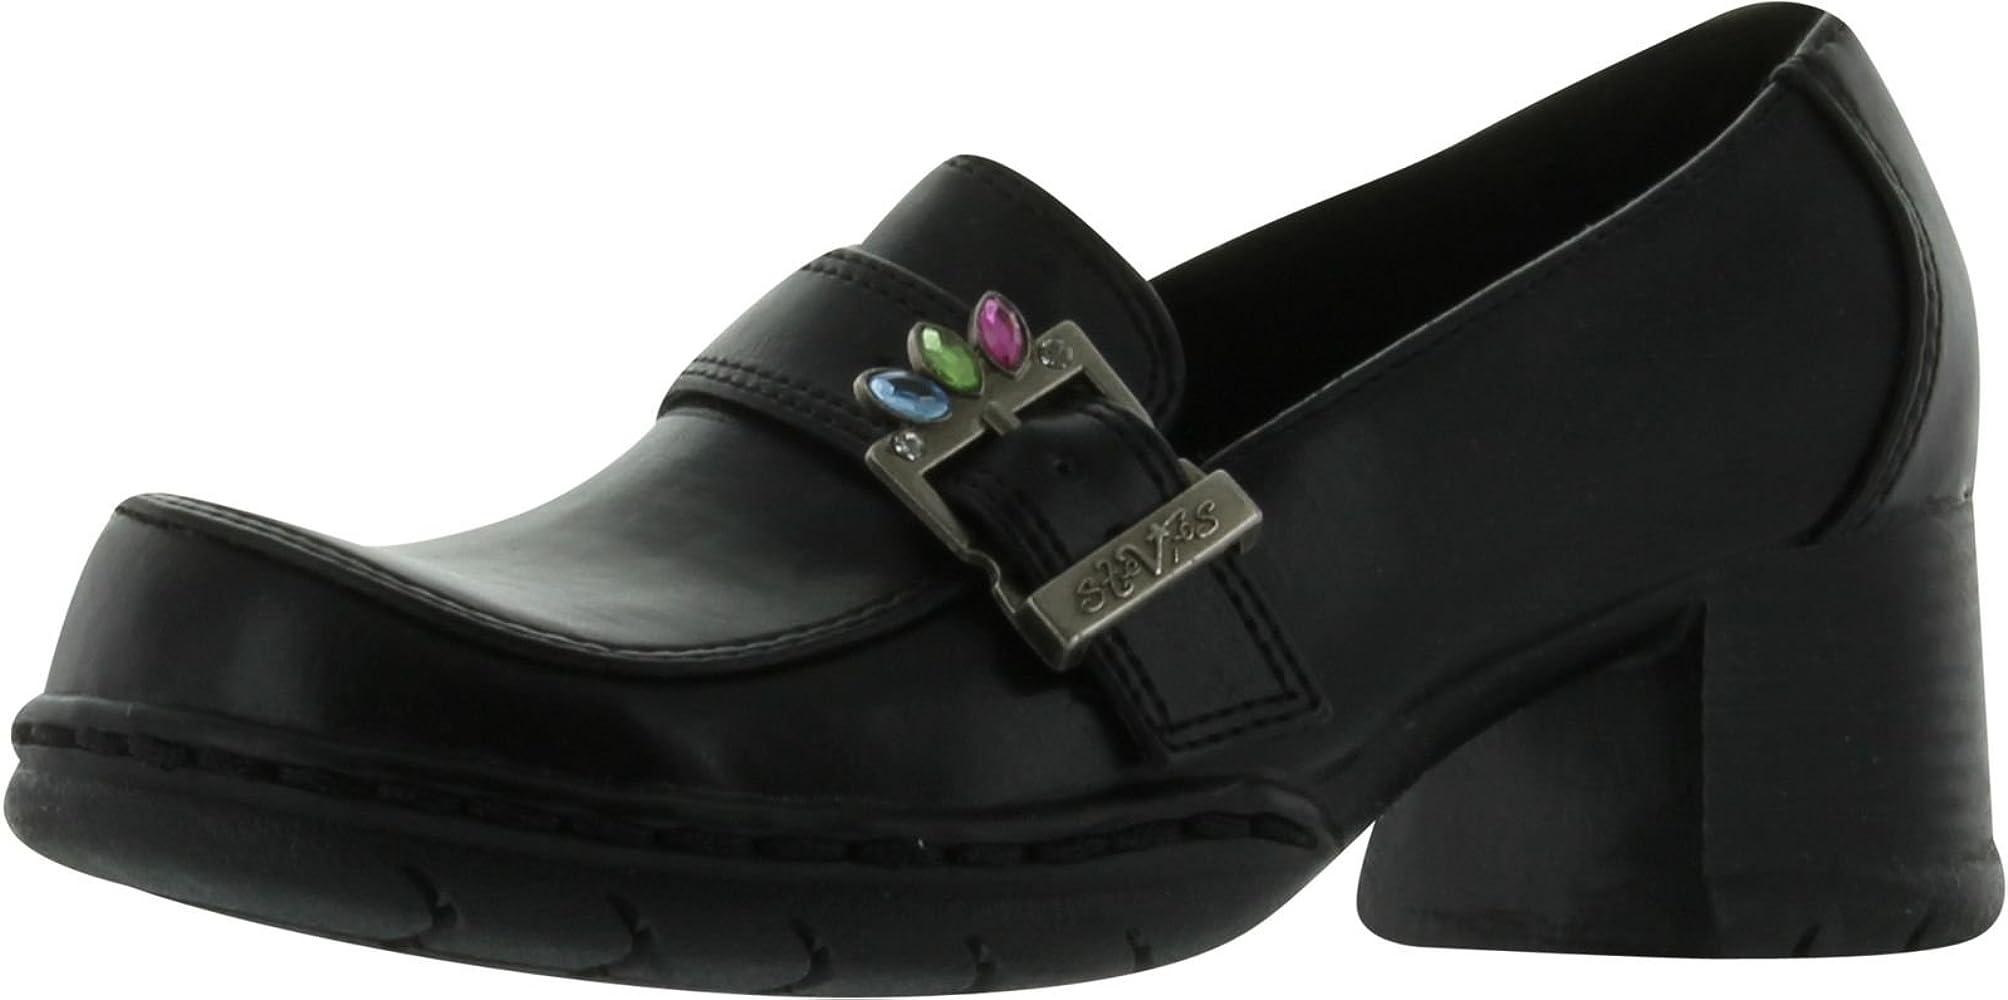 Stevies Girls Parisa Shoes, Black